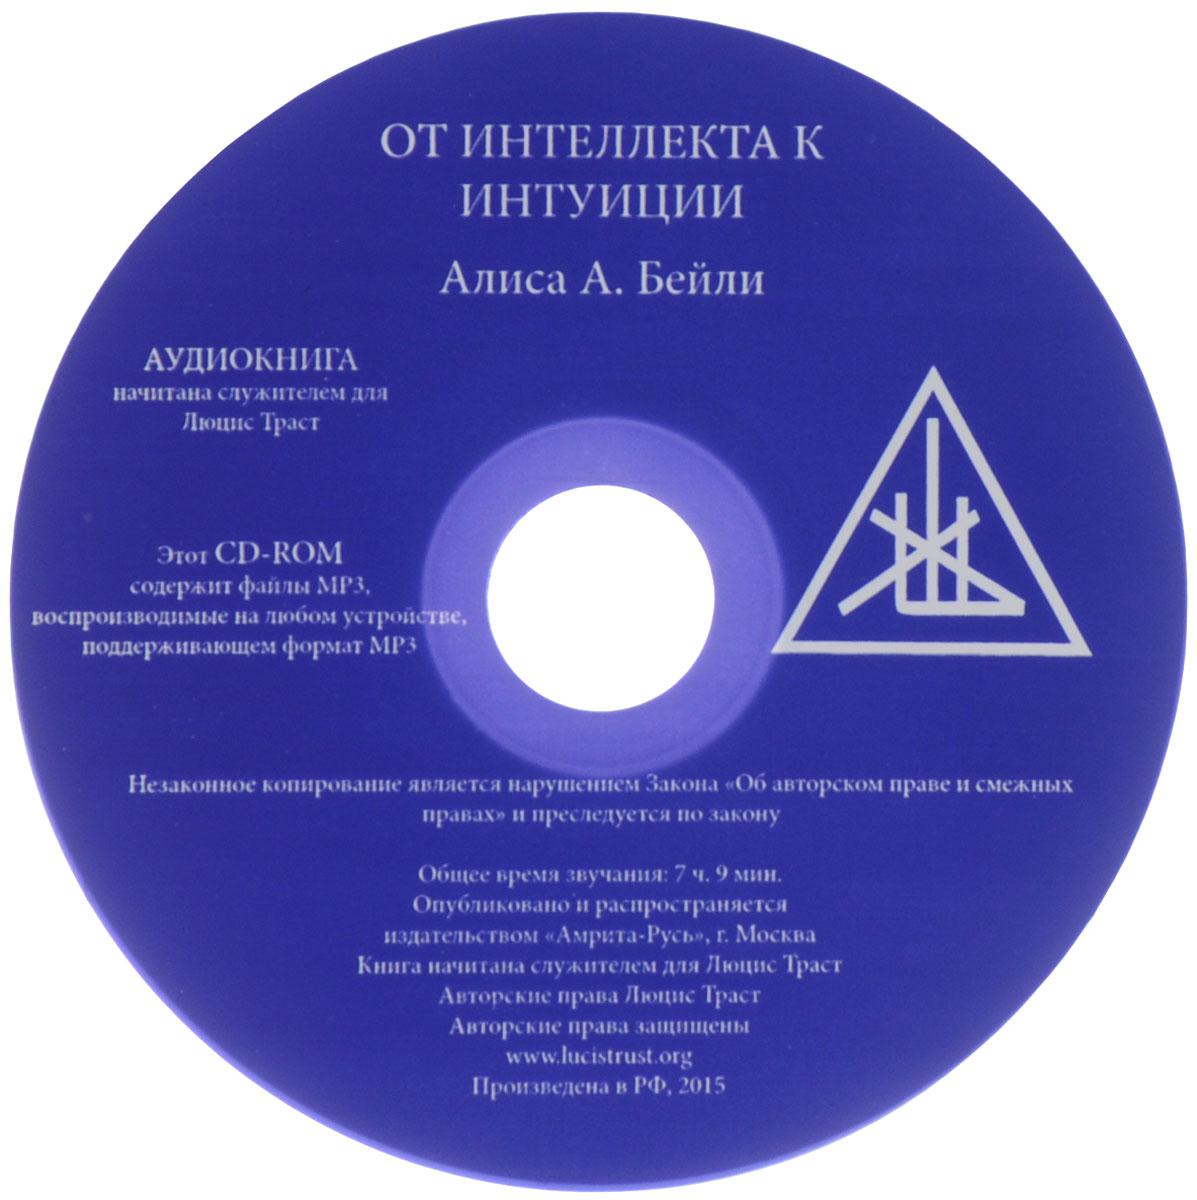 От интеллекта к интуиции (аудиокнига CD-ROM). Алиса А. Бейли